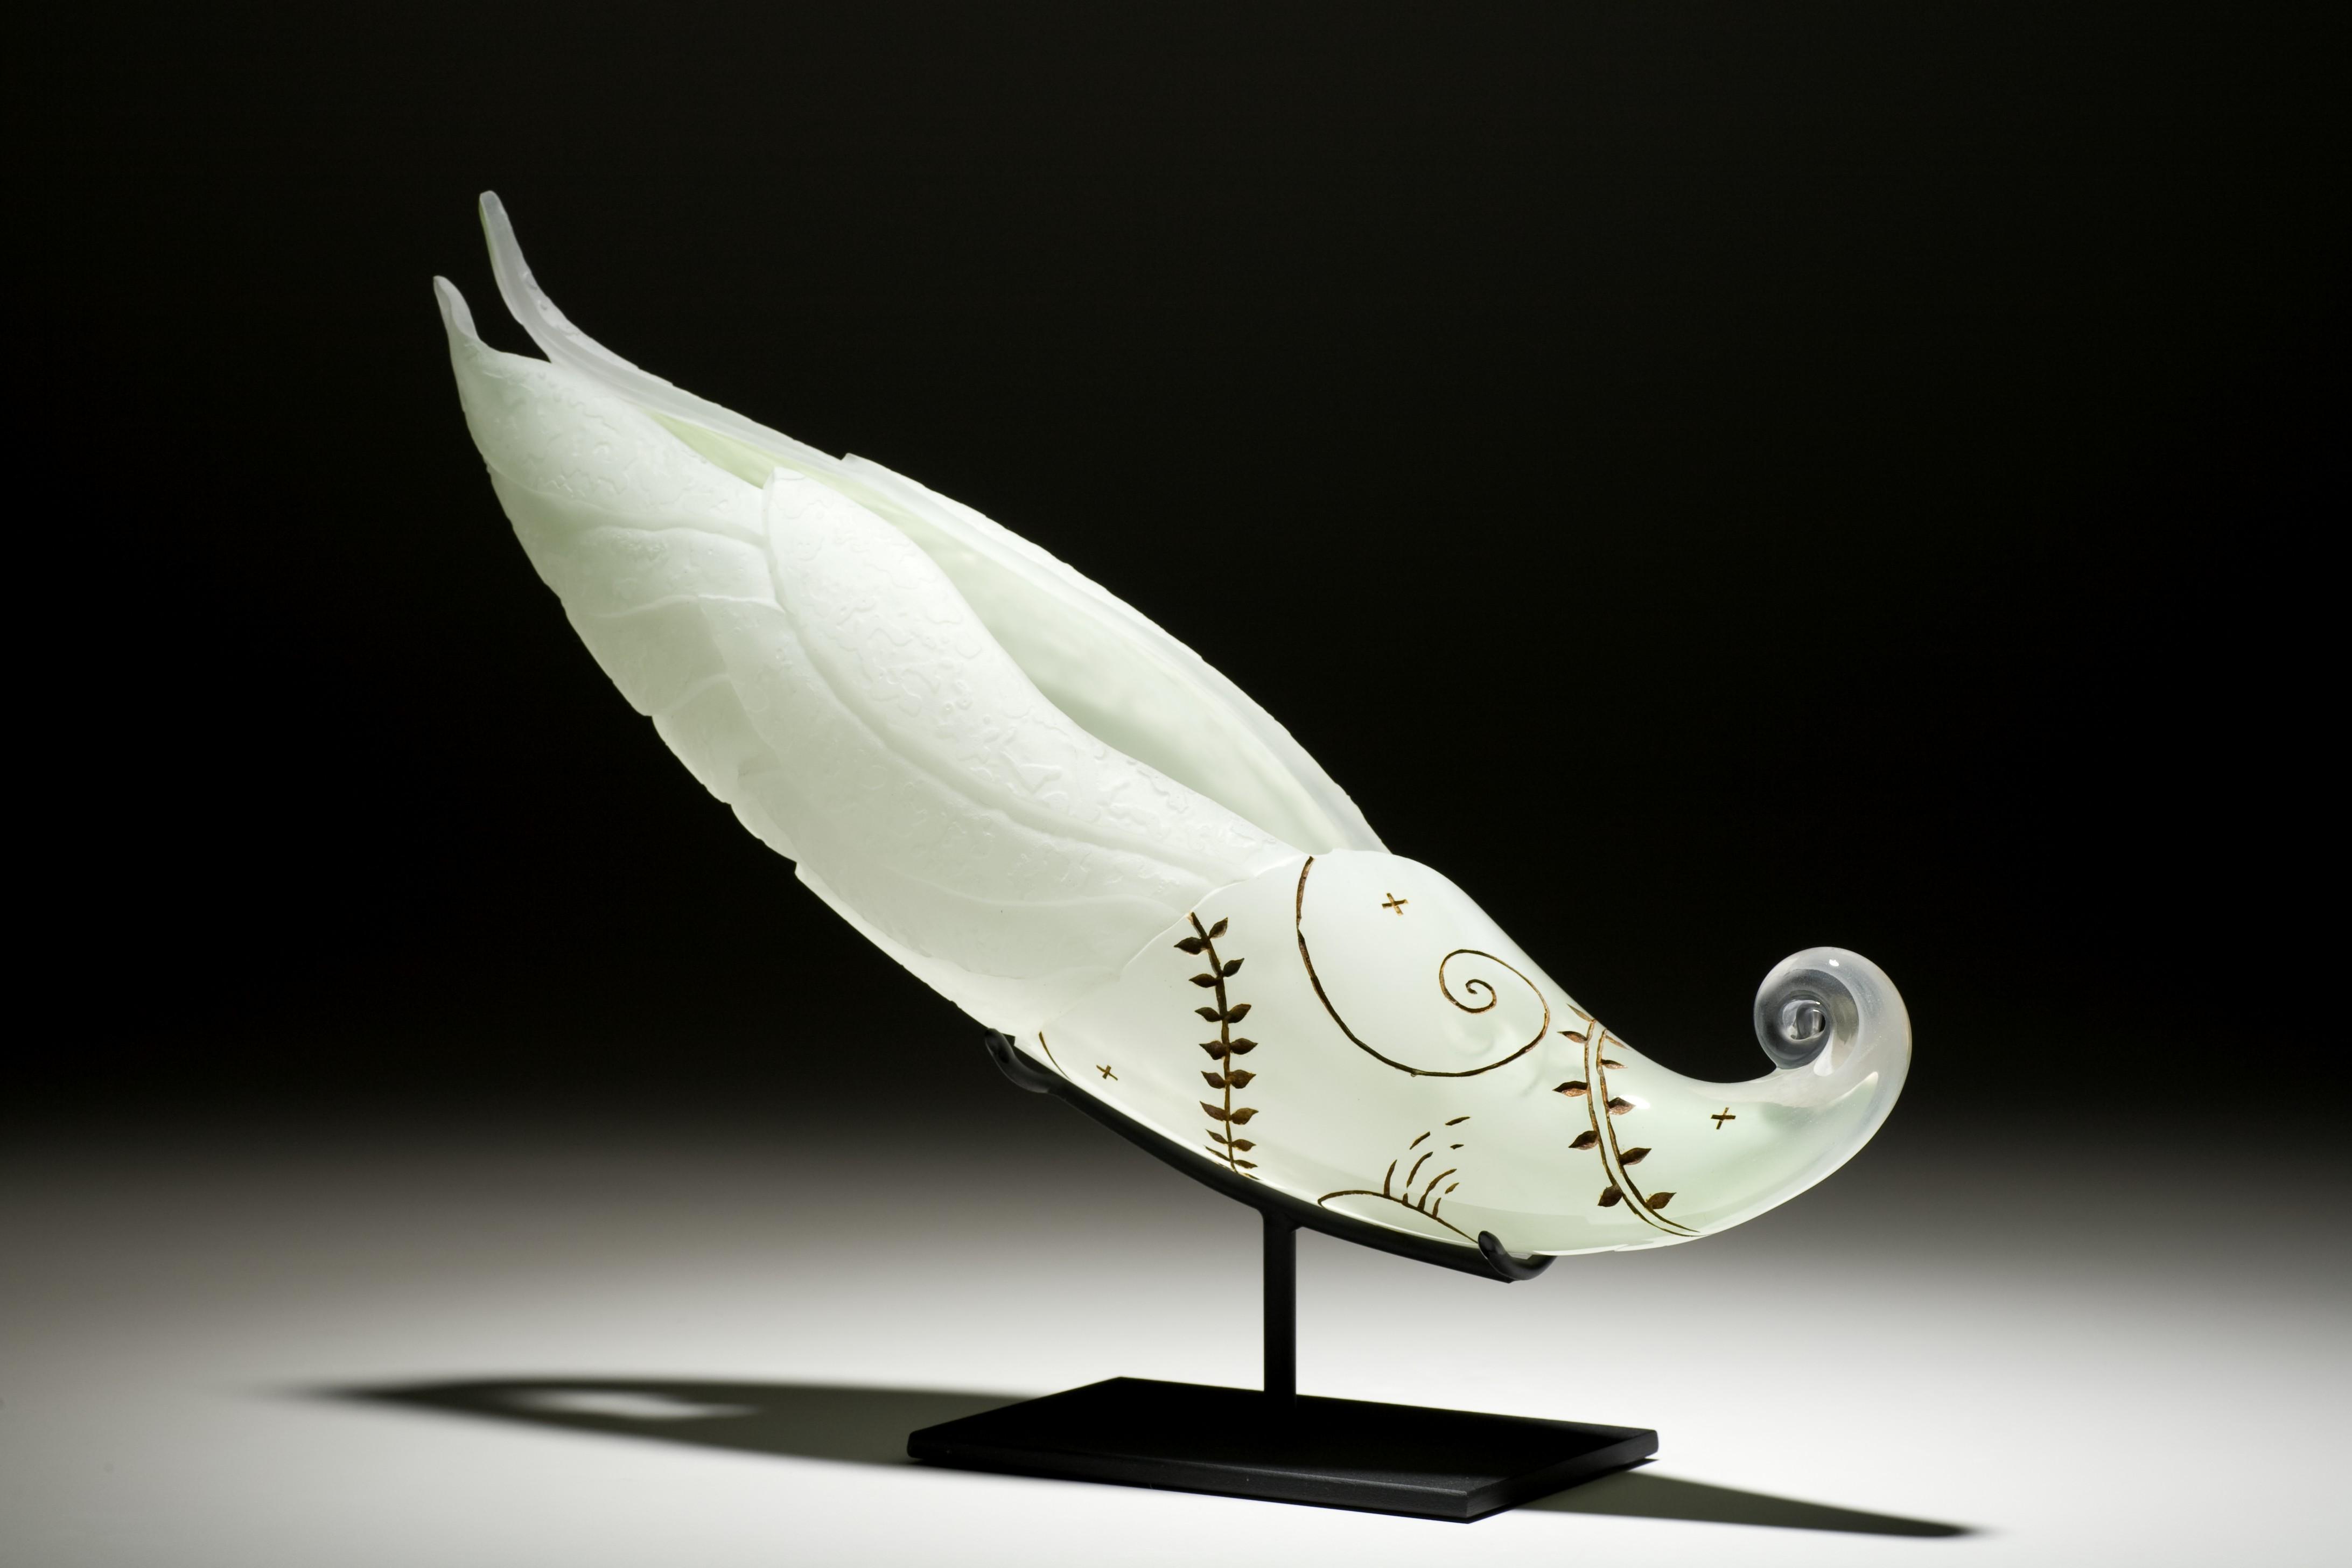 Naokoglasssculptures-770x470111.jpg